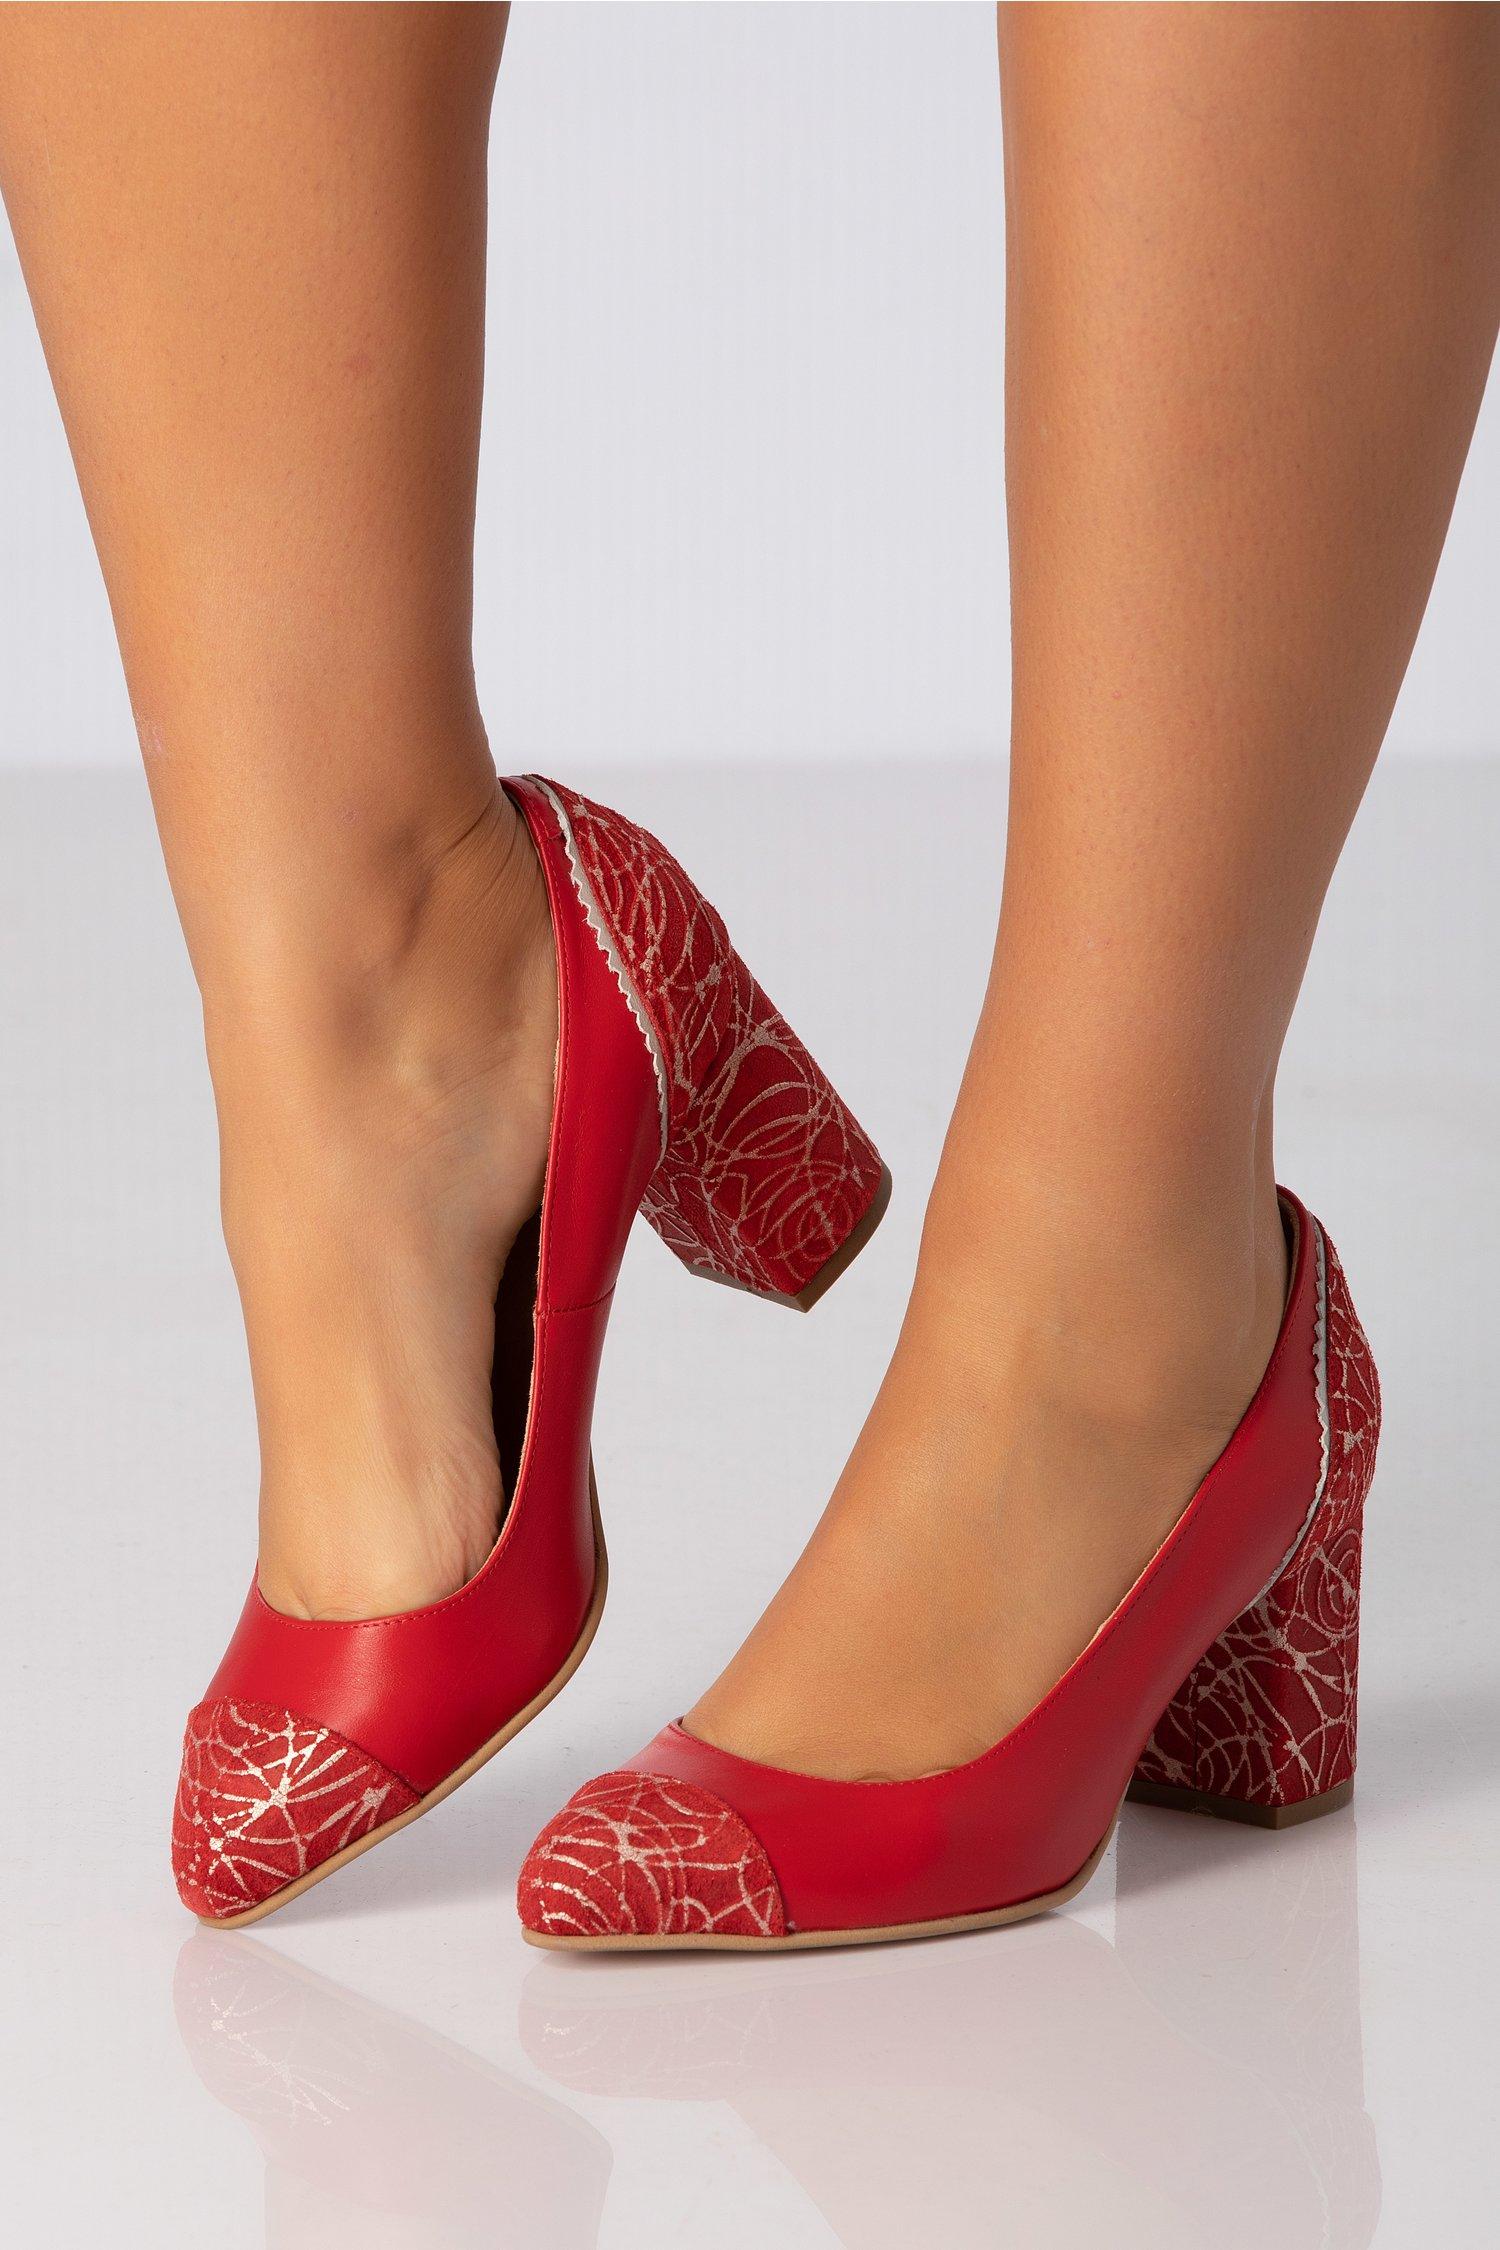 Pantofi rosii cu insertii argintii in zona varfului si a tocului